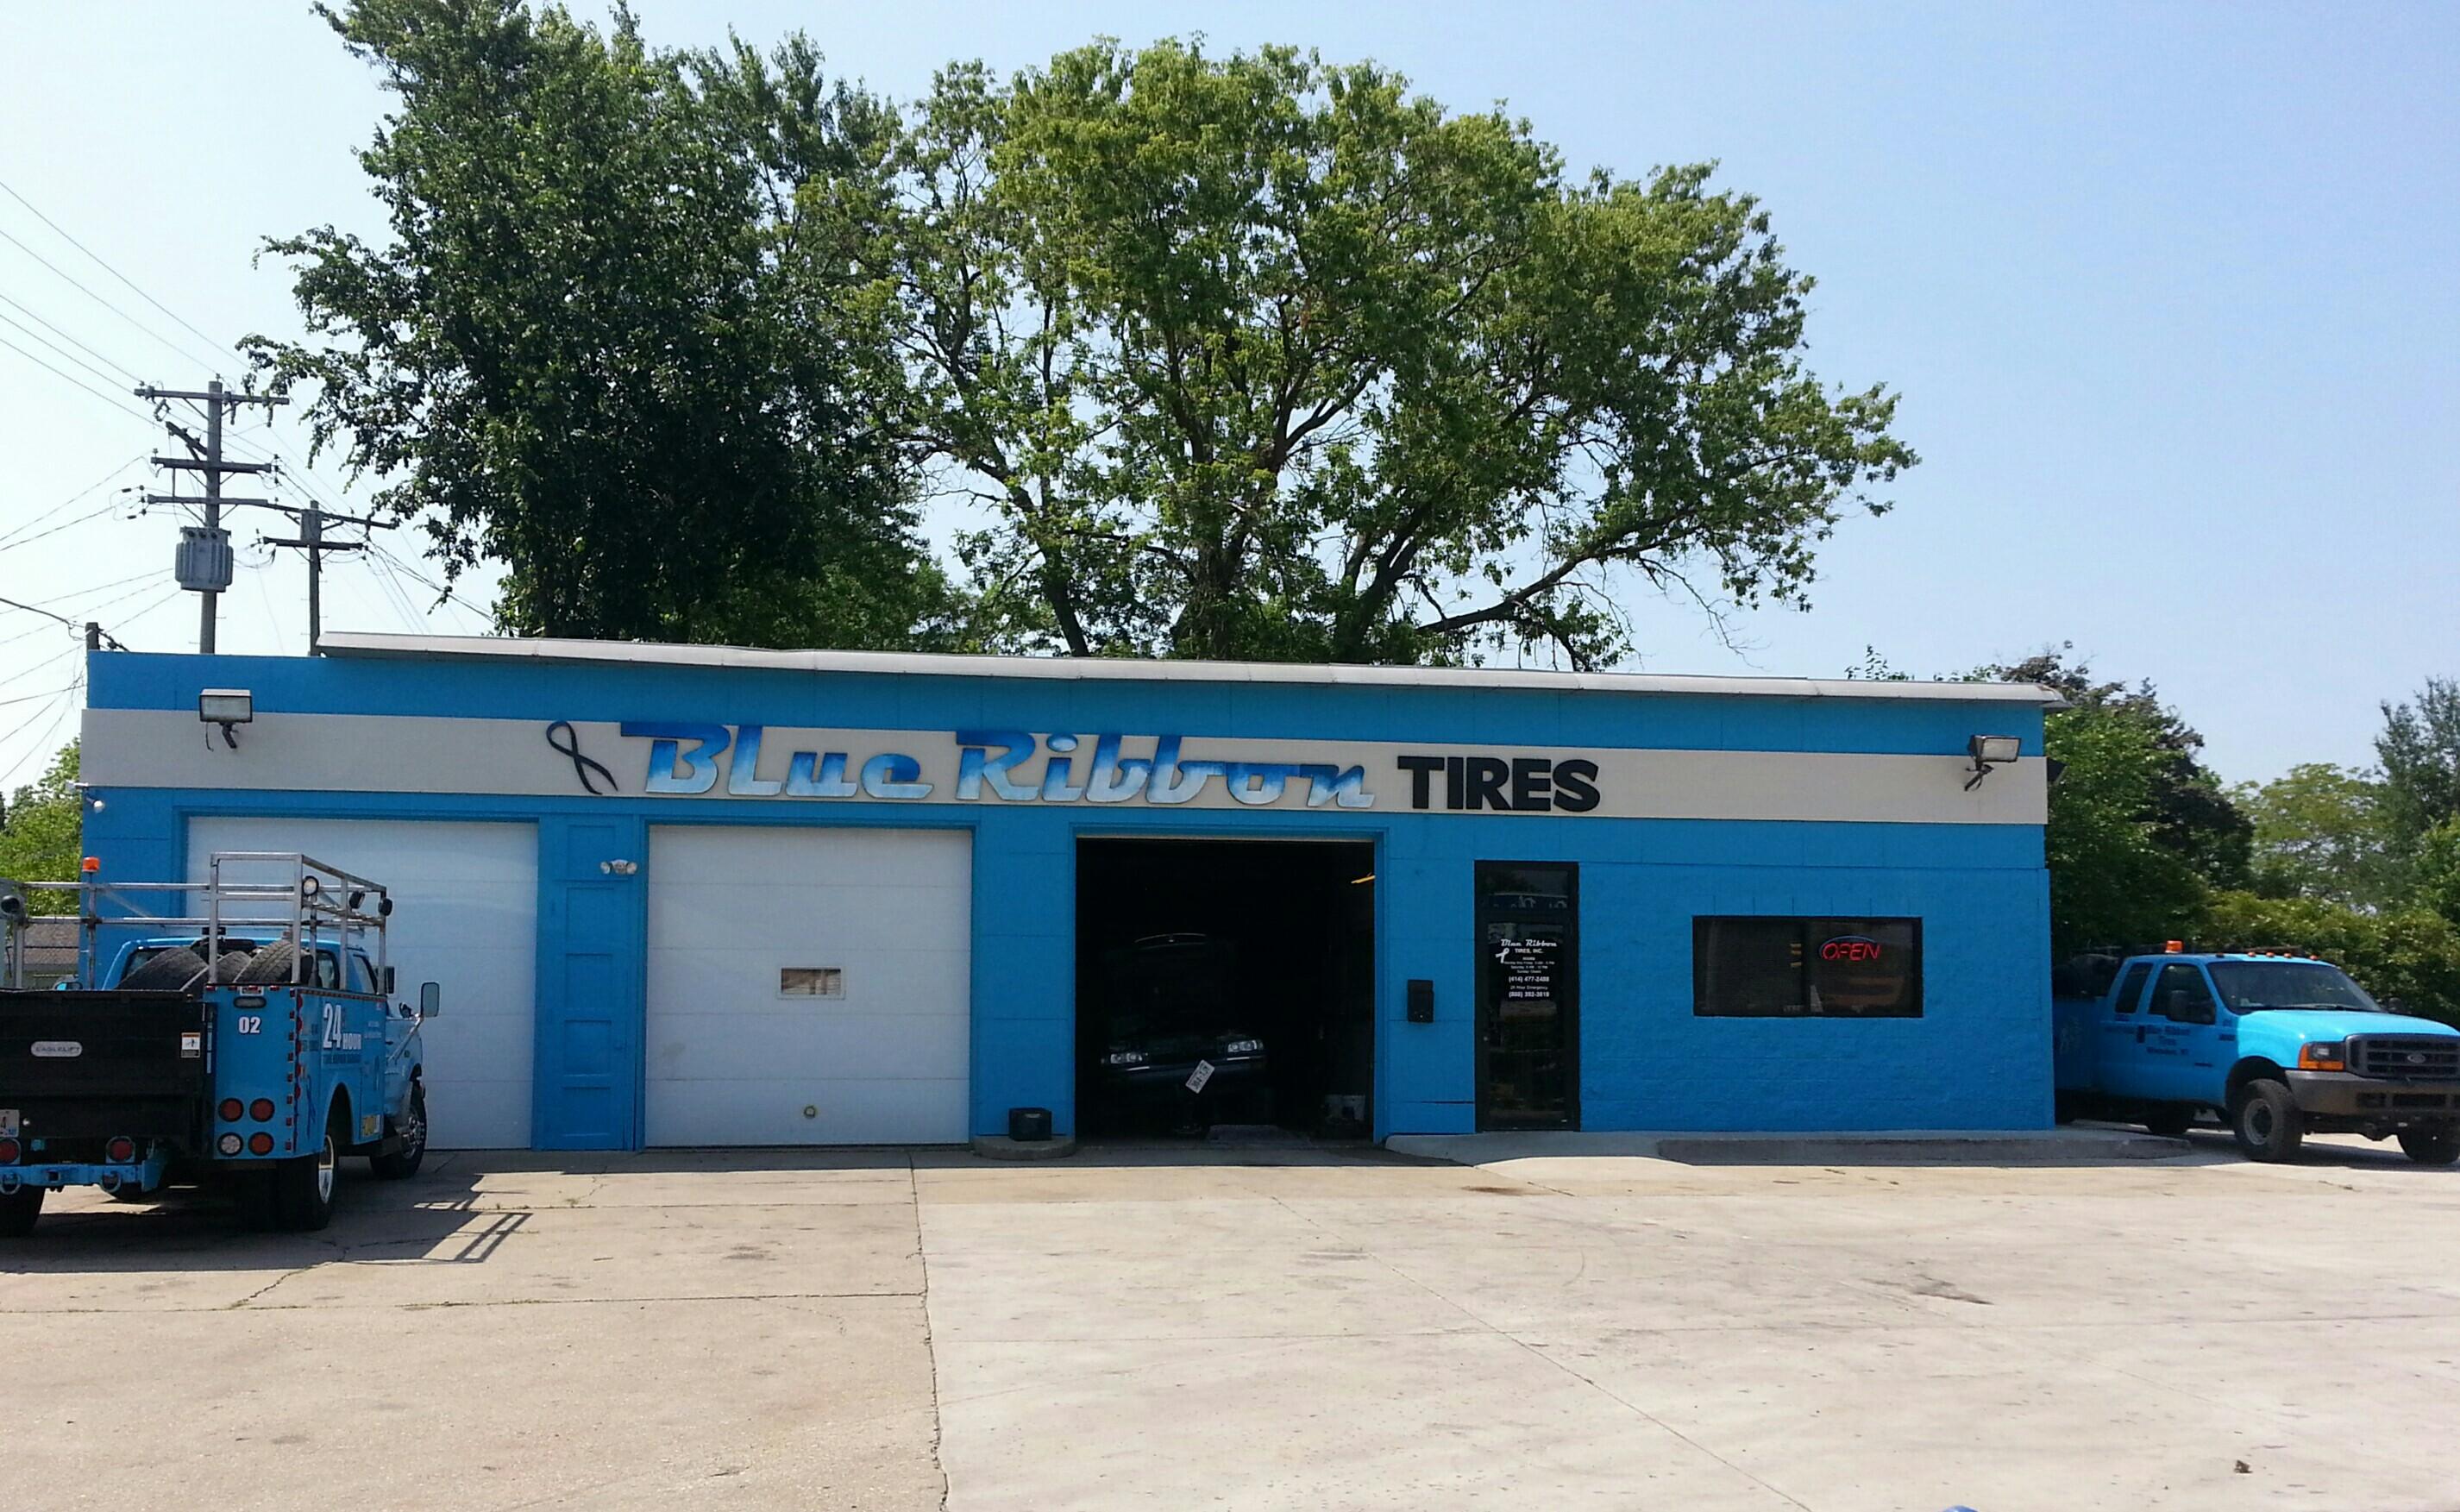 Blue Ribbon Tires 5829 W Villard Ave Milwaukee Wi 53218 Yp Com